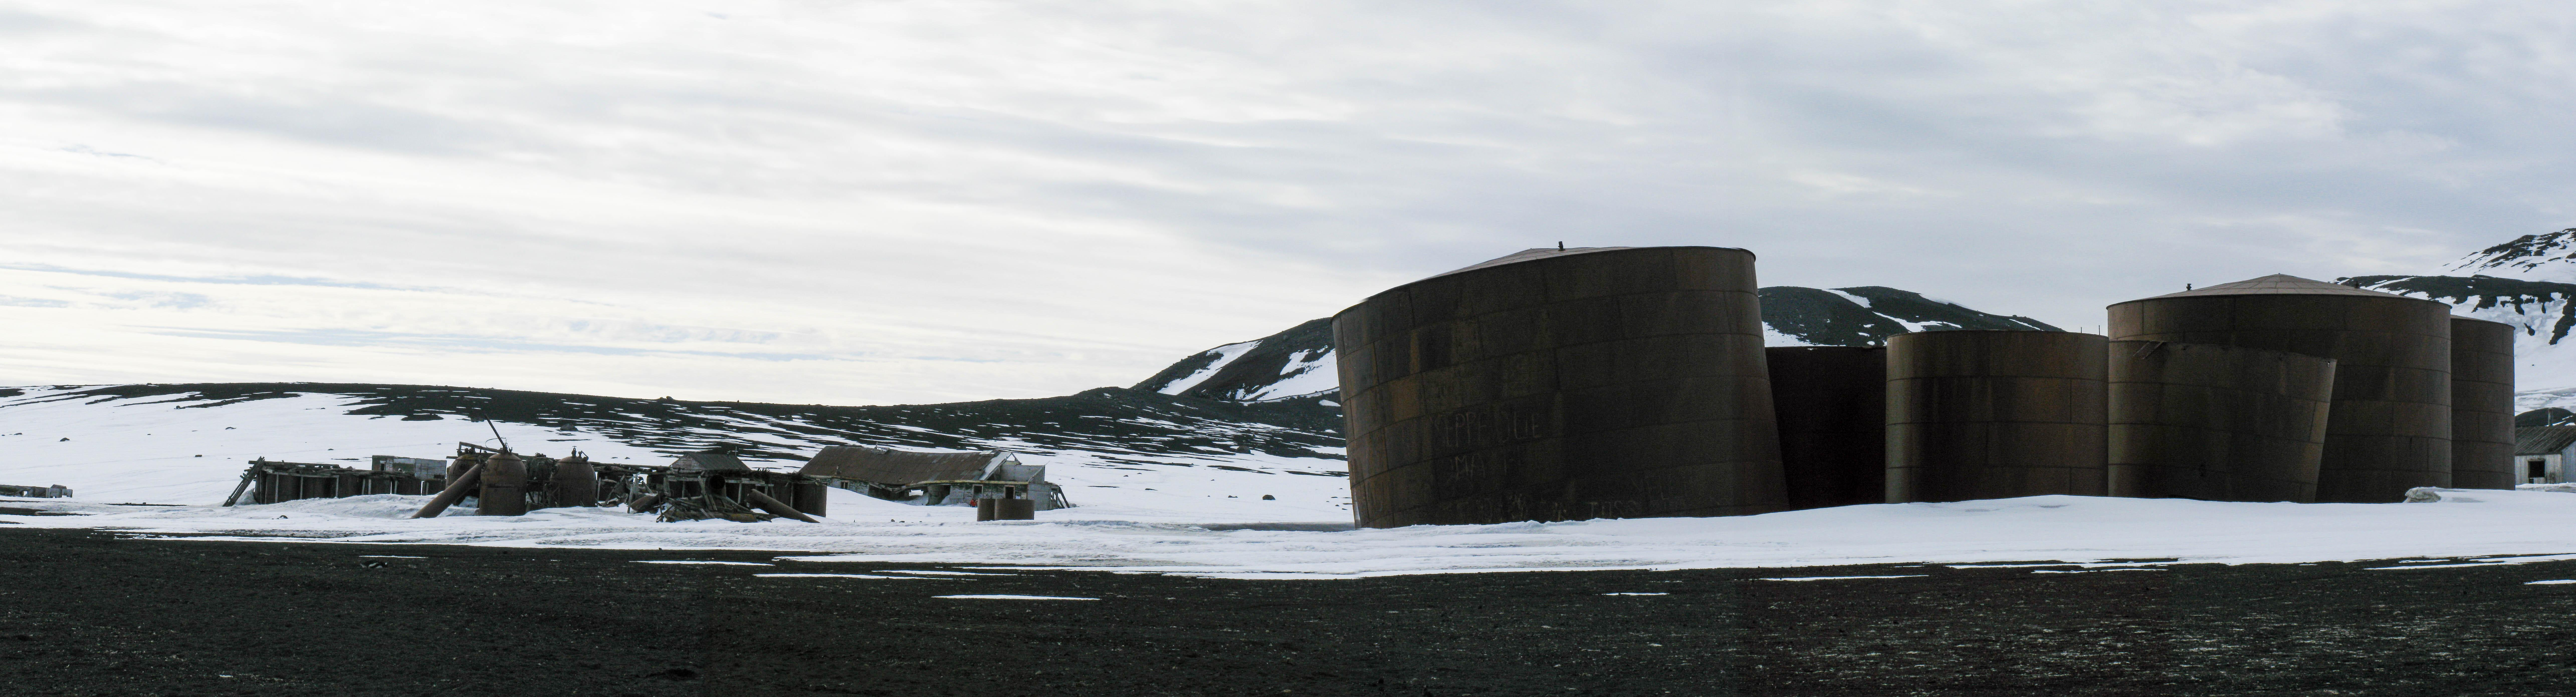 Deception Island whaling station pan